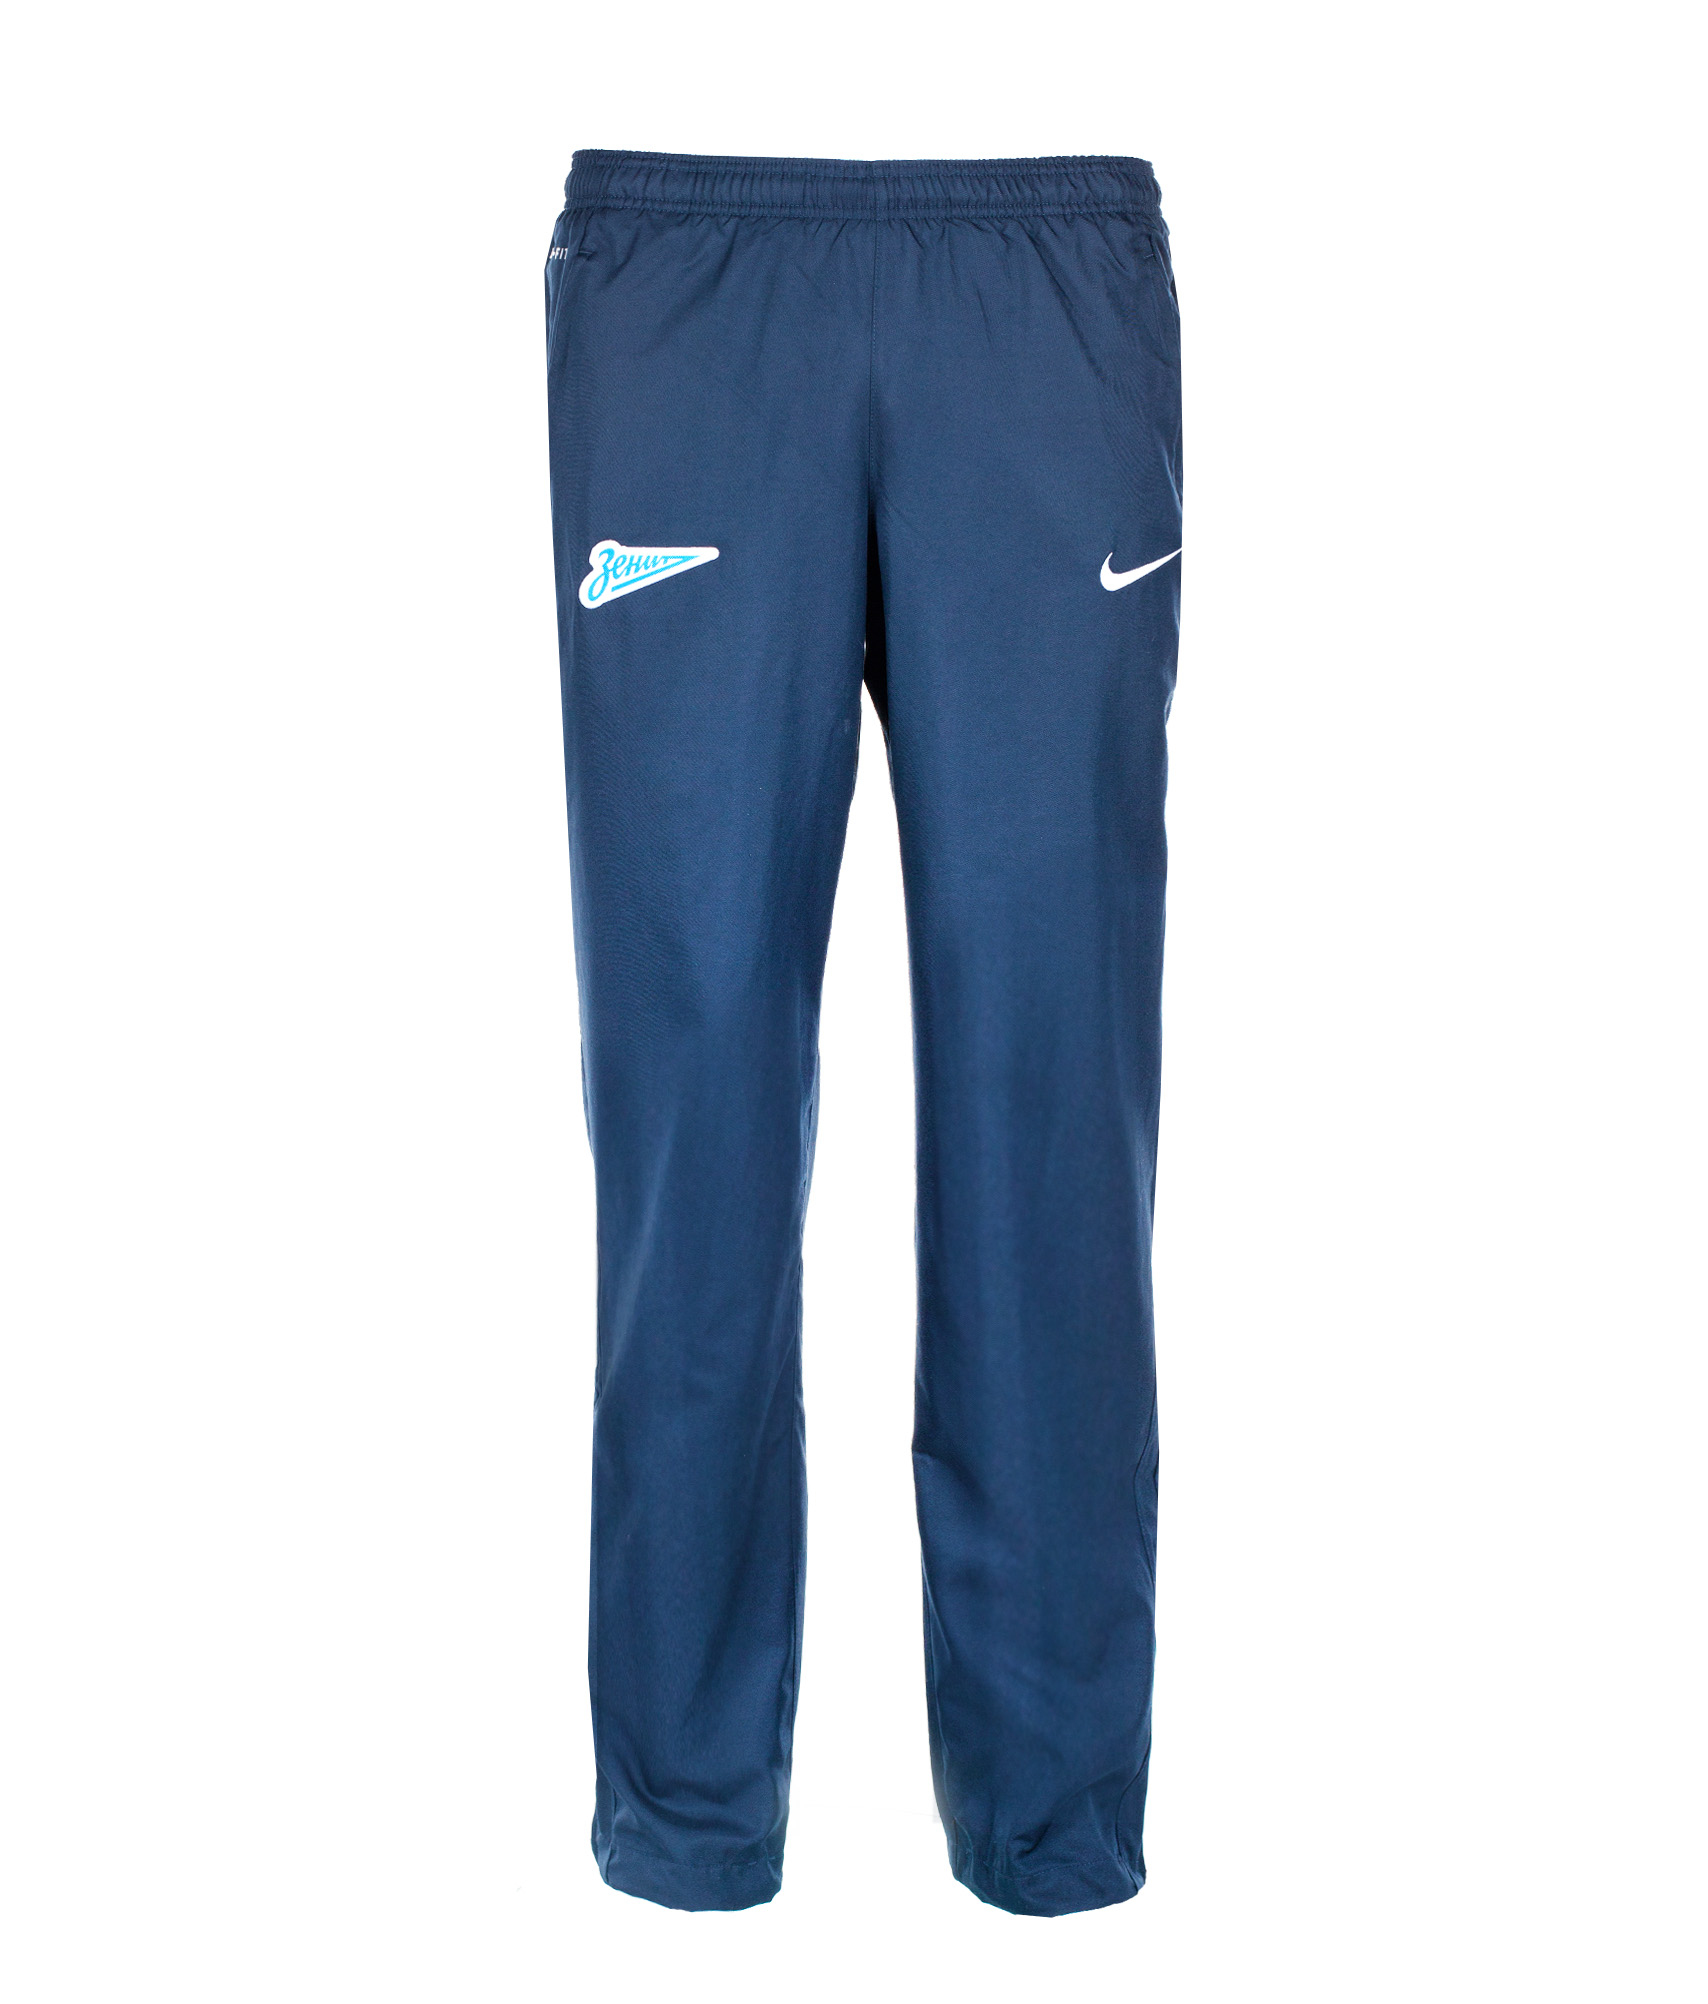 Брюки Nike Zenit Select Sdln WVN Pant, Цвет-Синий, Размер-XL